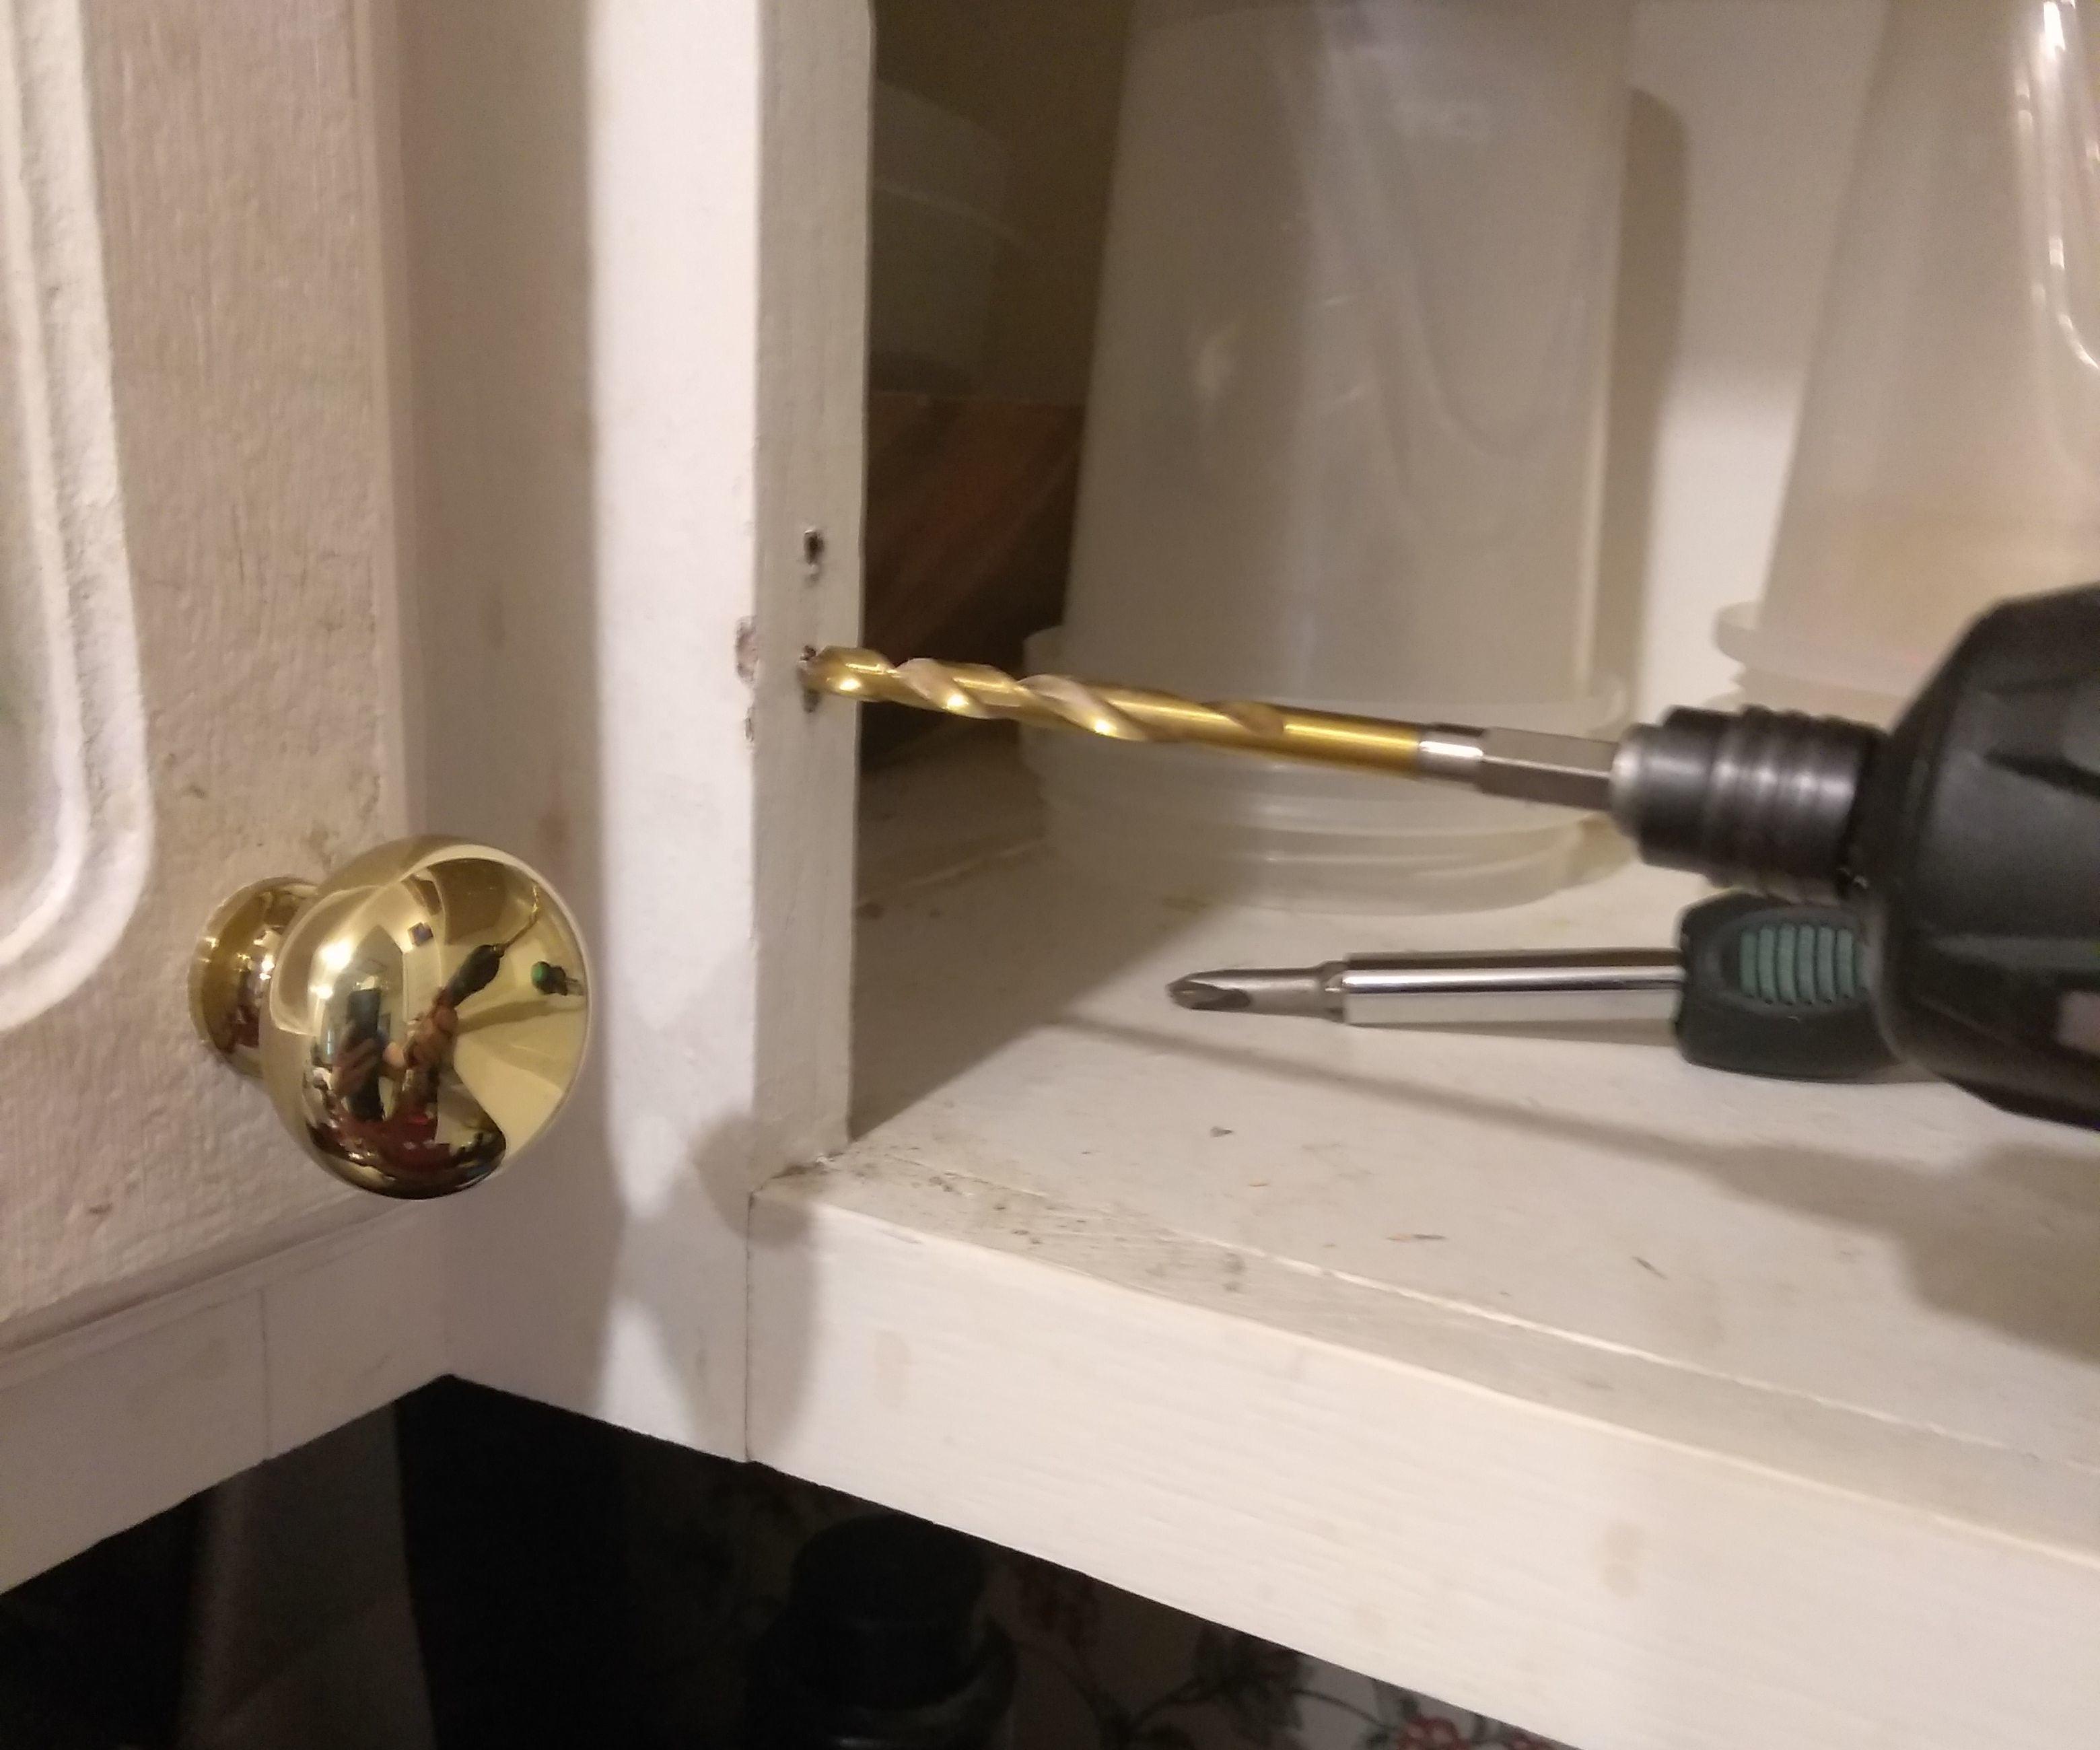 Repairing Stripped Cabinet Hinges